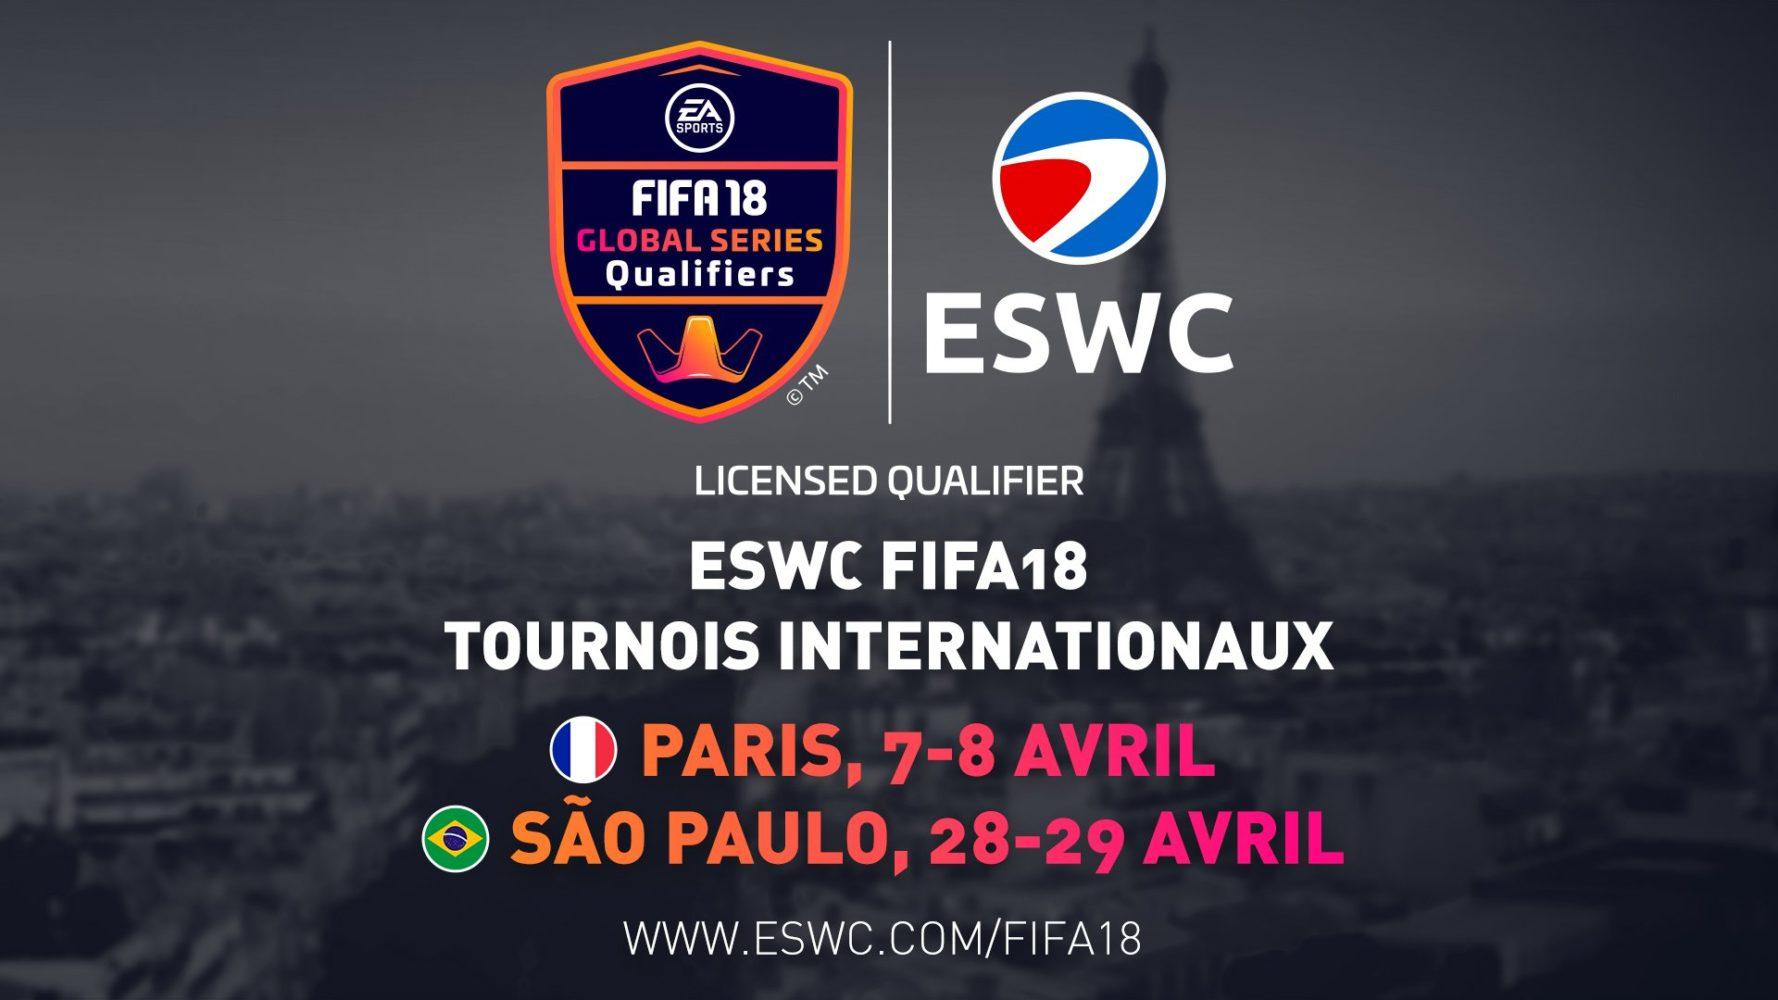 ESWC FIFA18-Paris-Sao-Paulo-Global-Series-FIFA-eWorld-Cup-2018